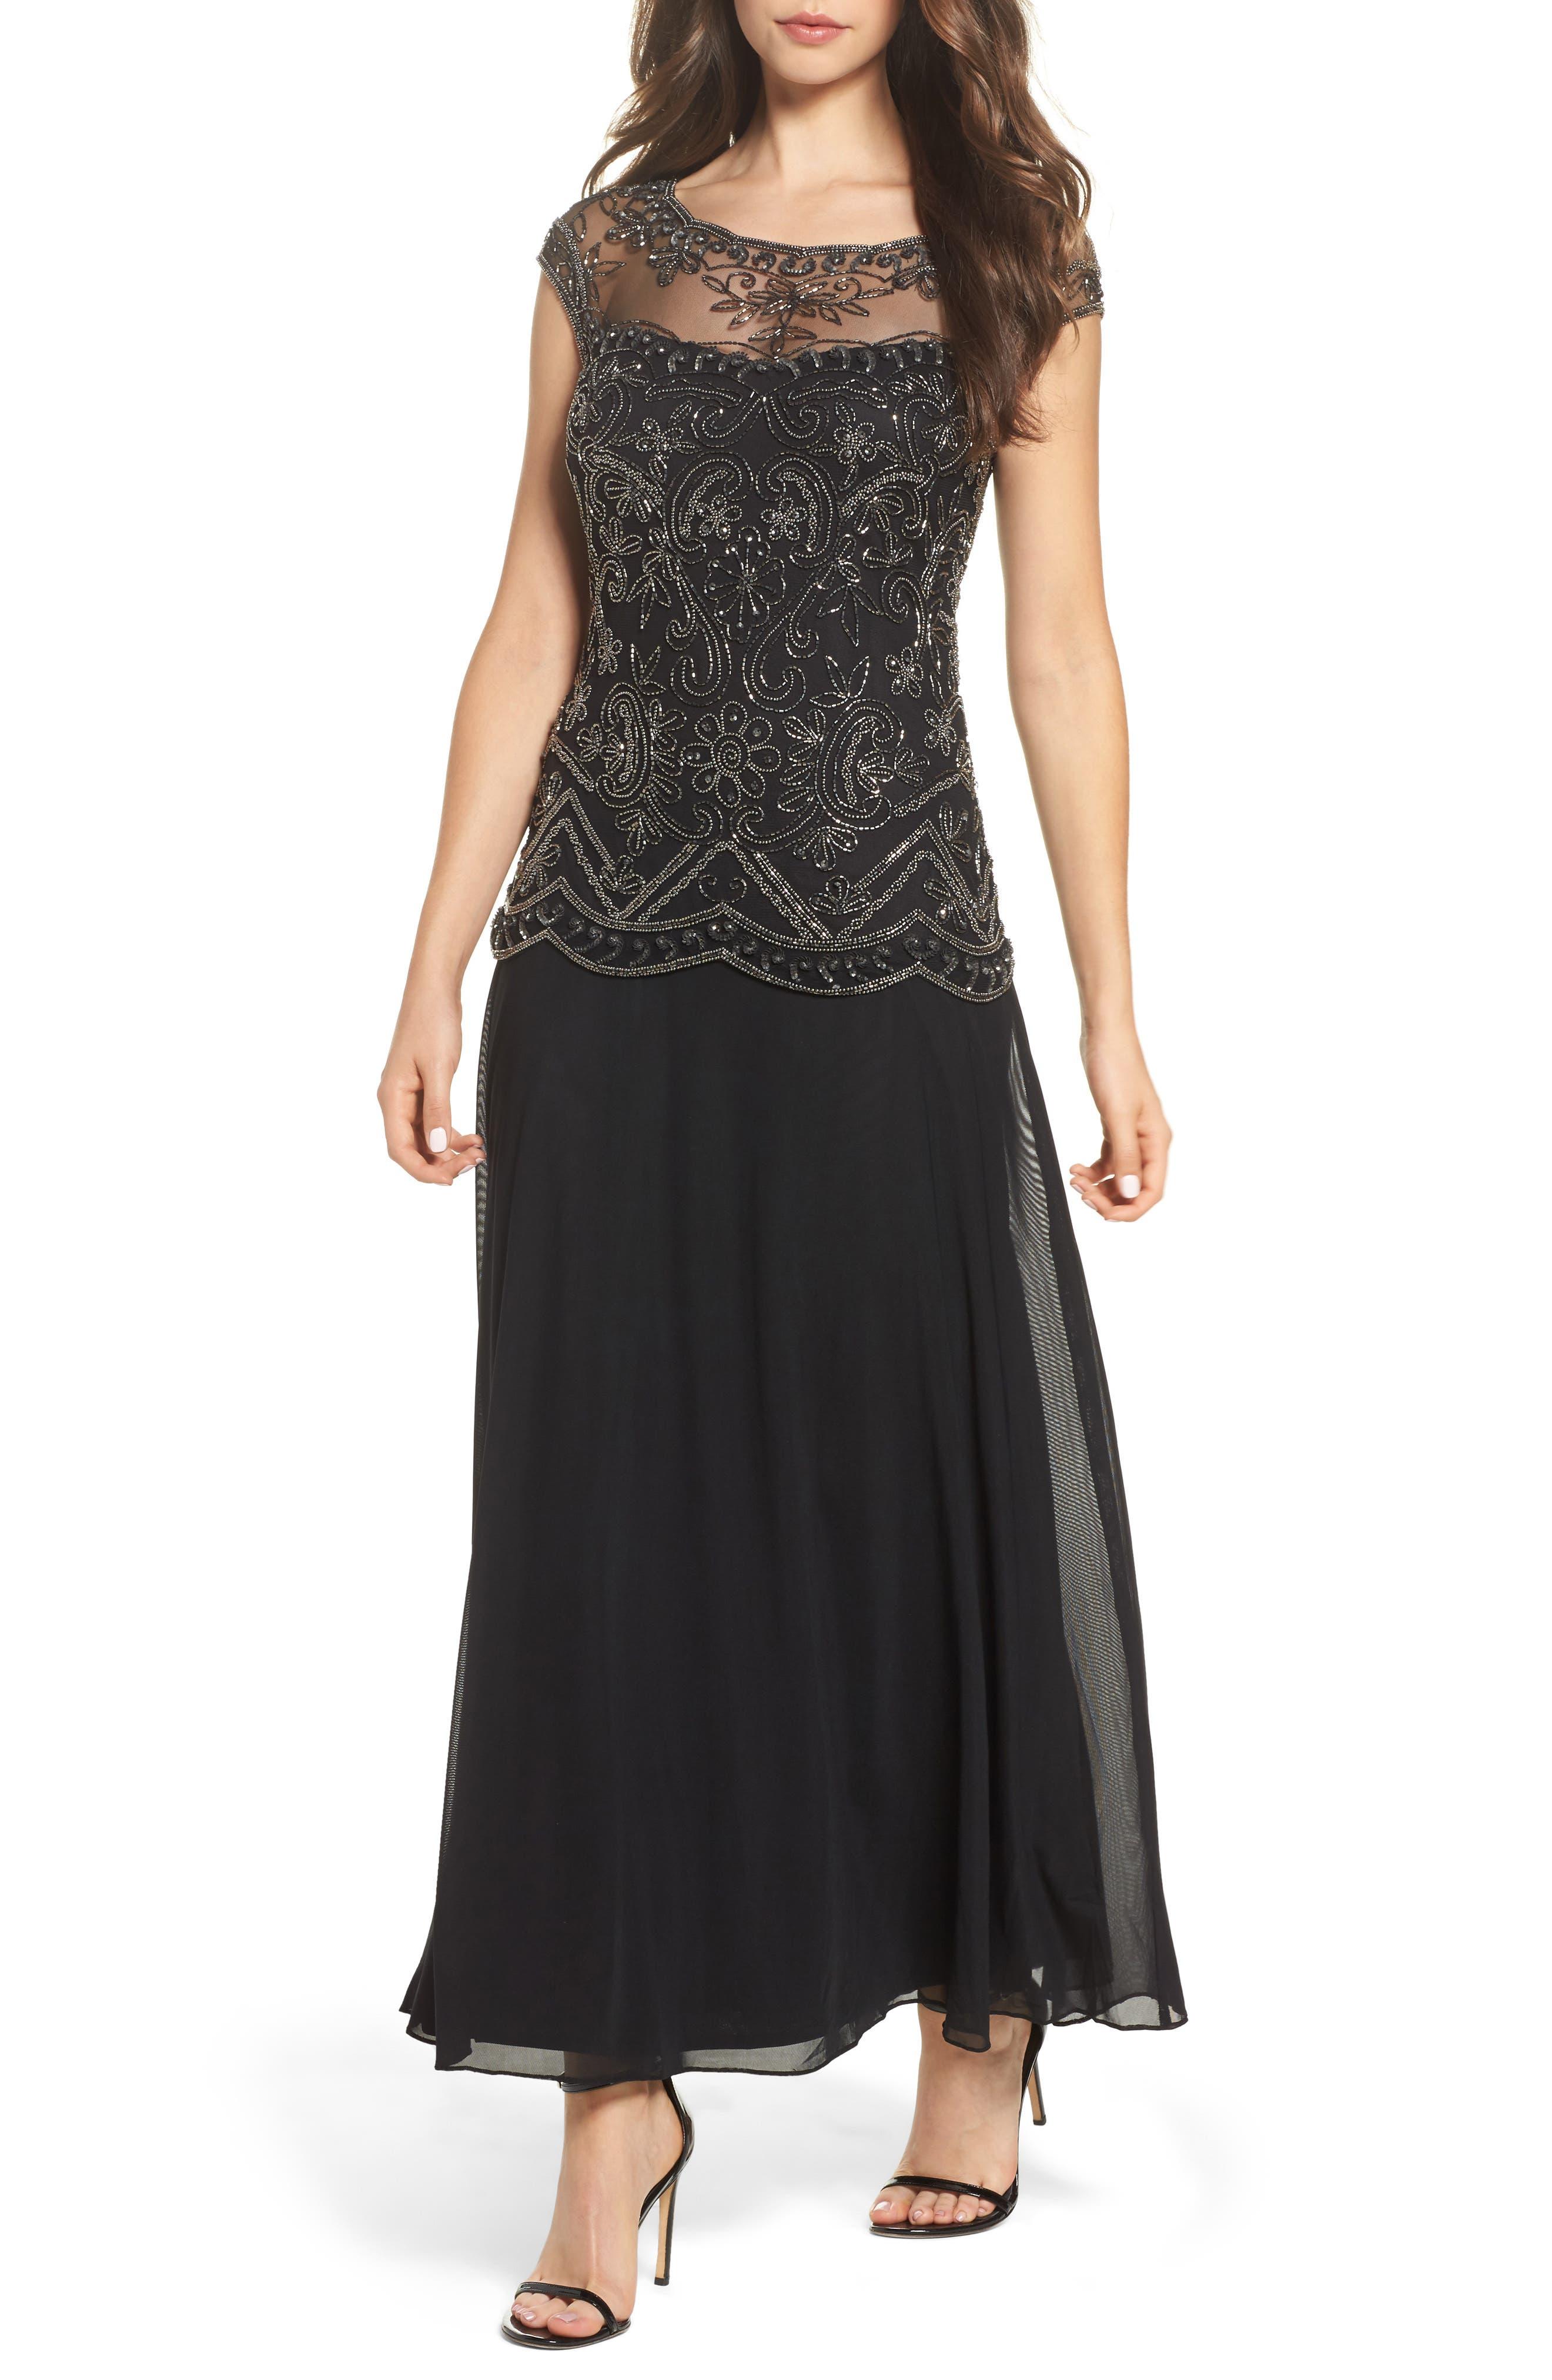 Pisarro Nights Embellished Cap Sleeve Long Dress